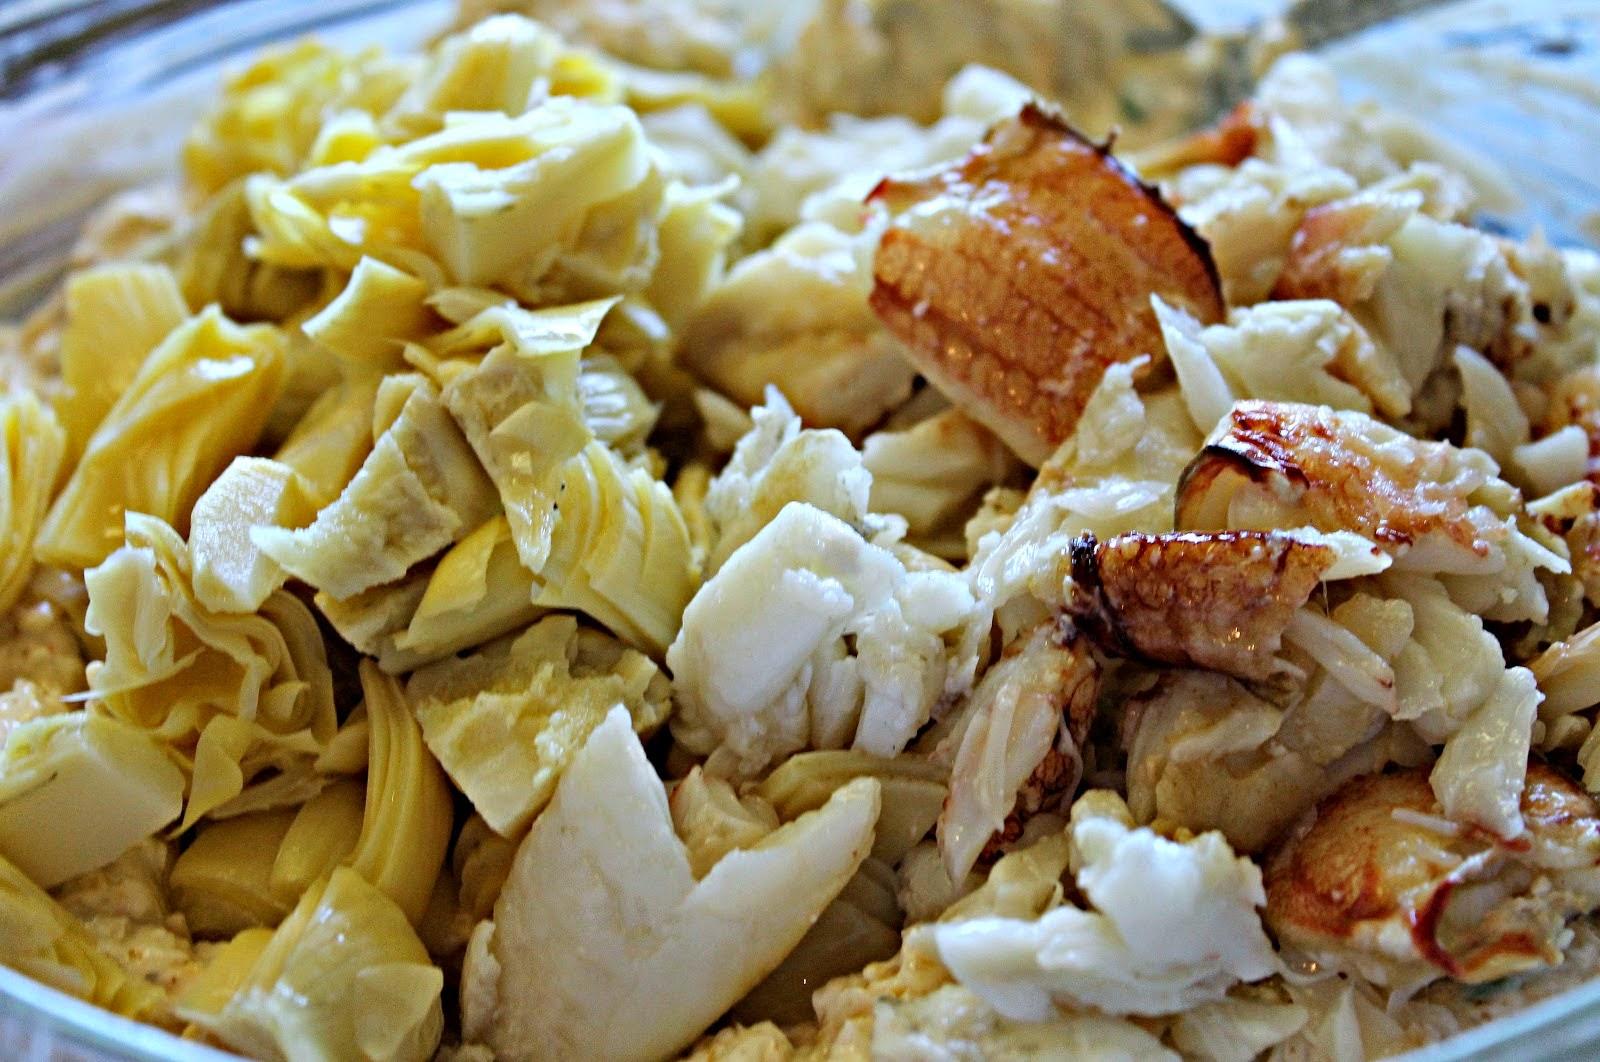 Chesapeake Bay Crab & Artichoke Salad